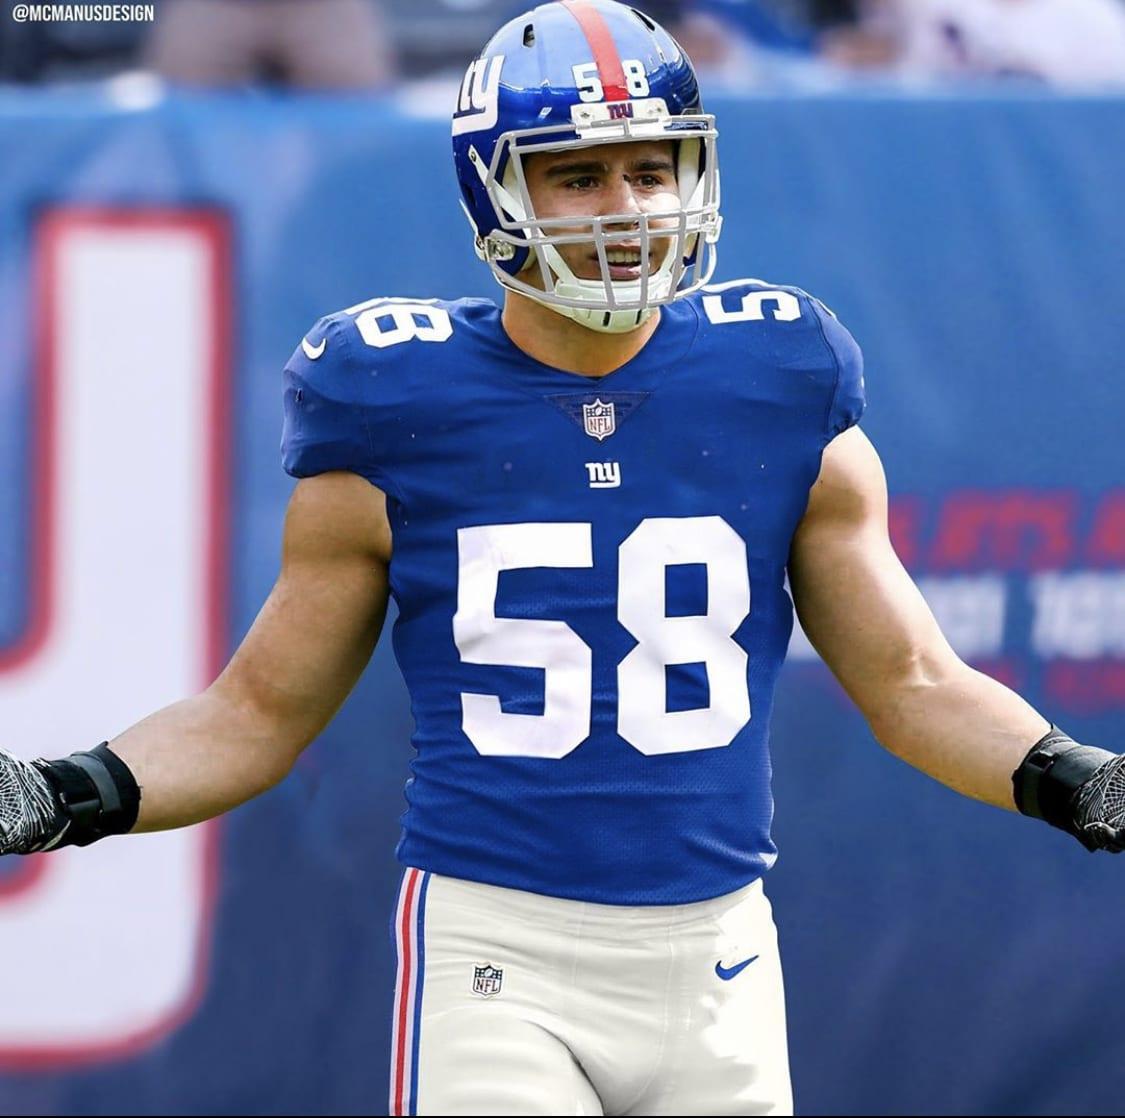 New York Giants, Blake Martinez, McManus Designs